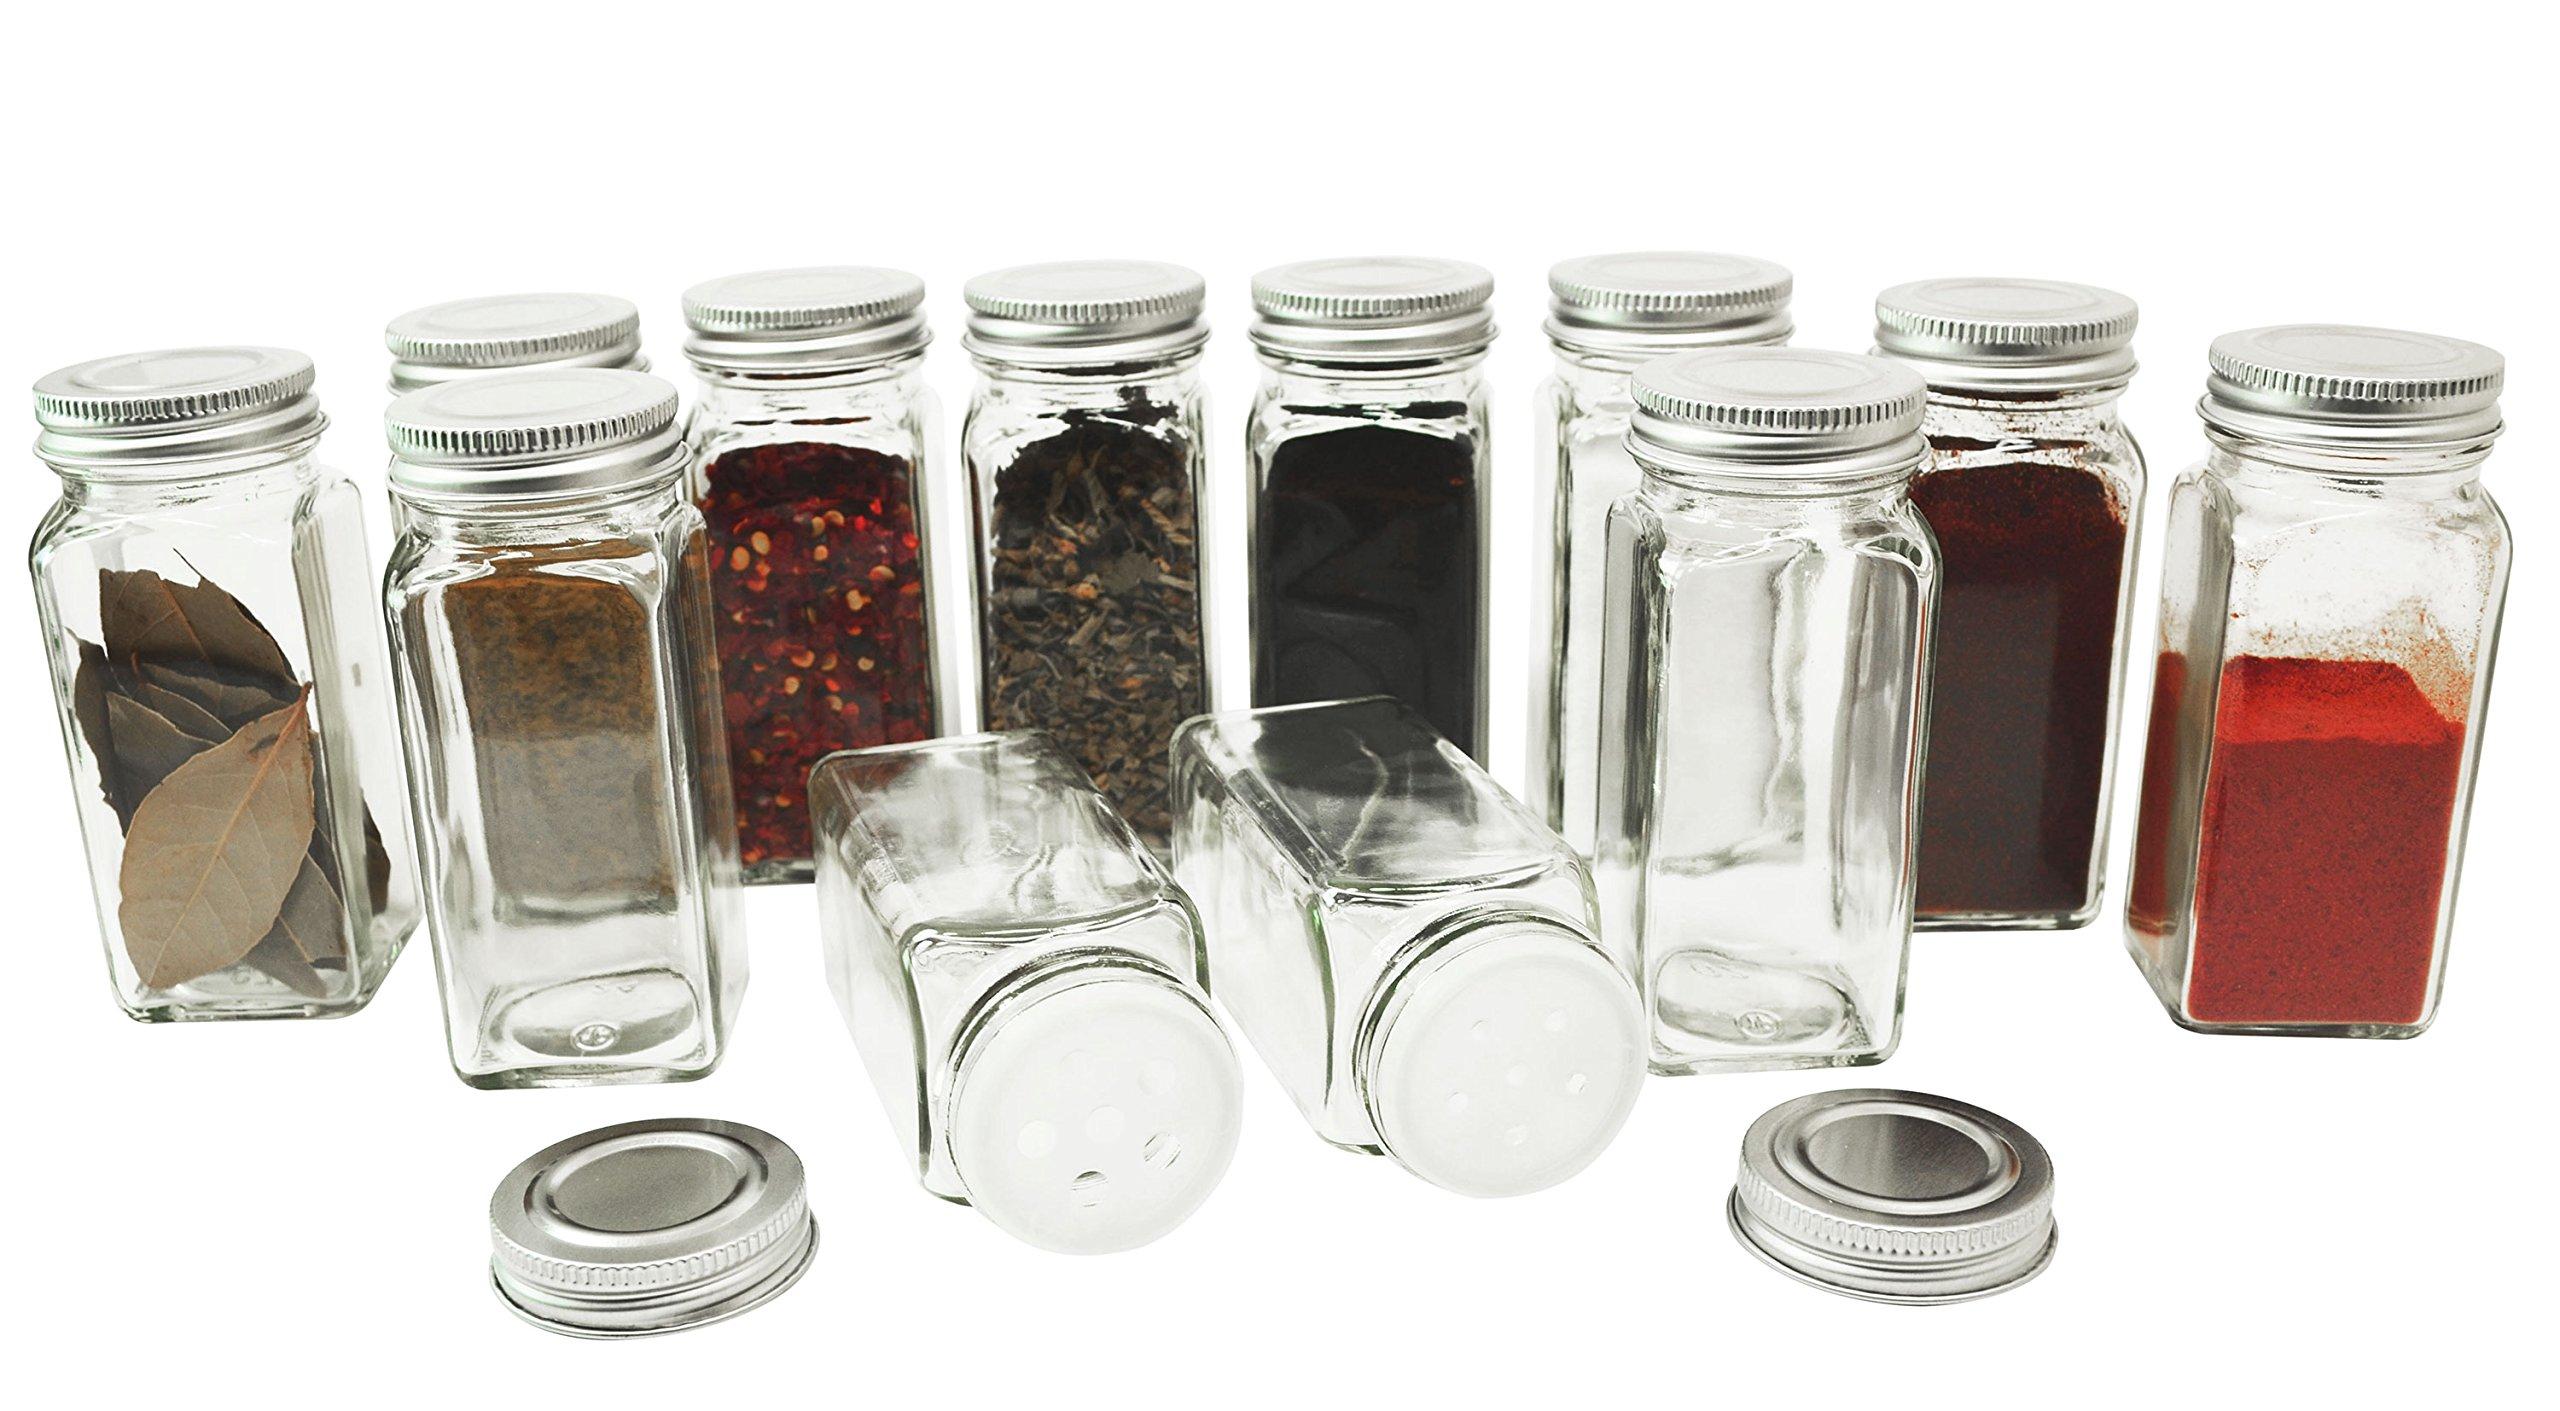 Oz Glass Jars With Metal Lids